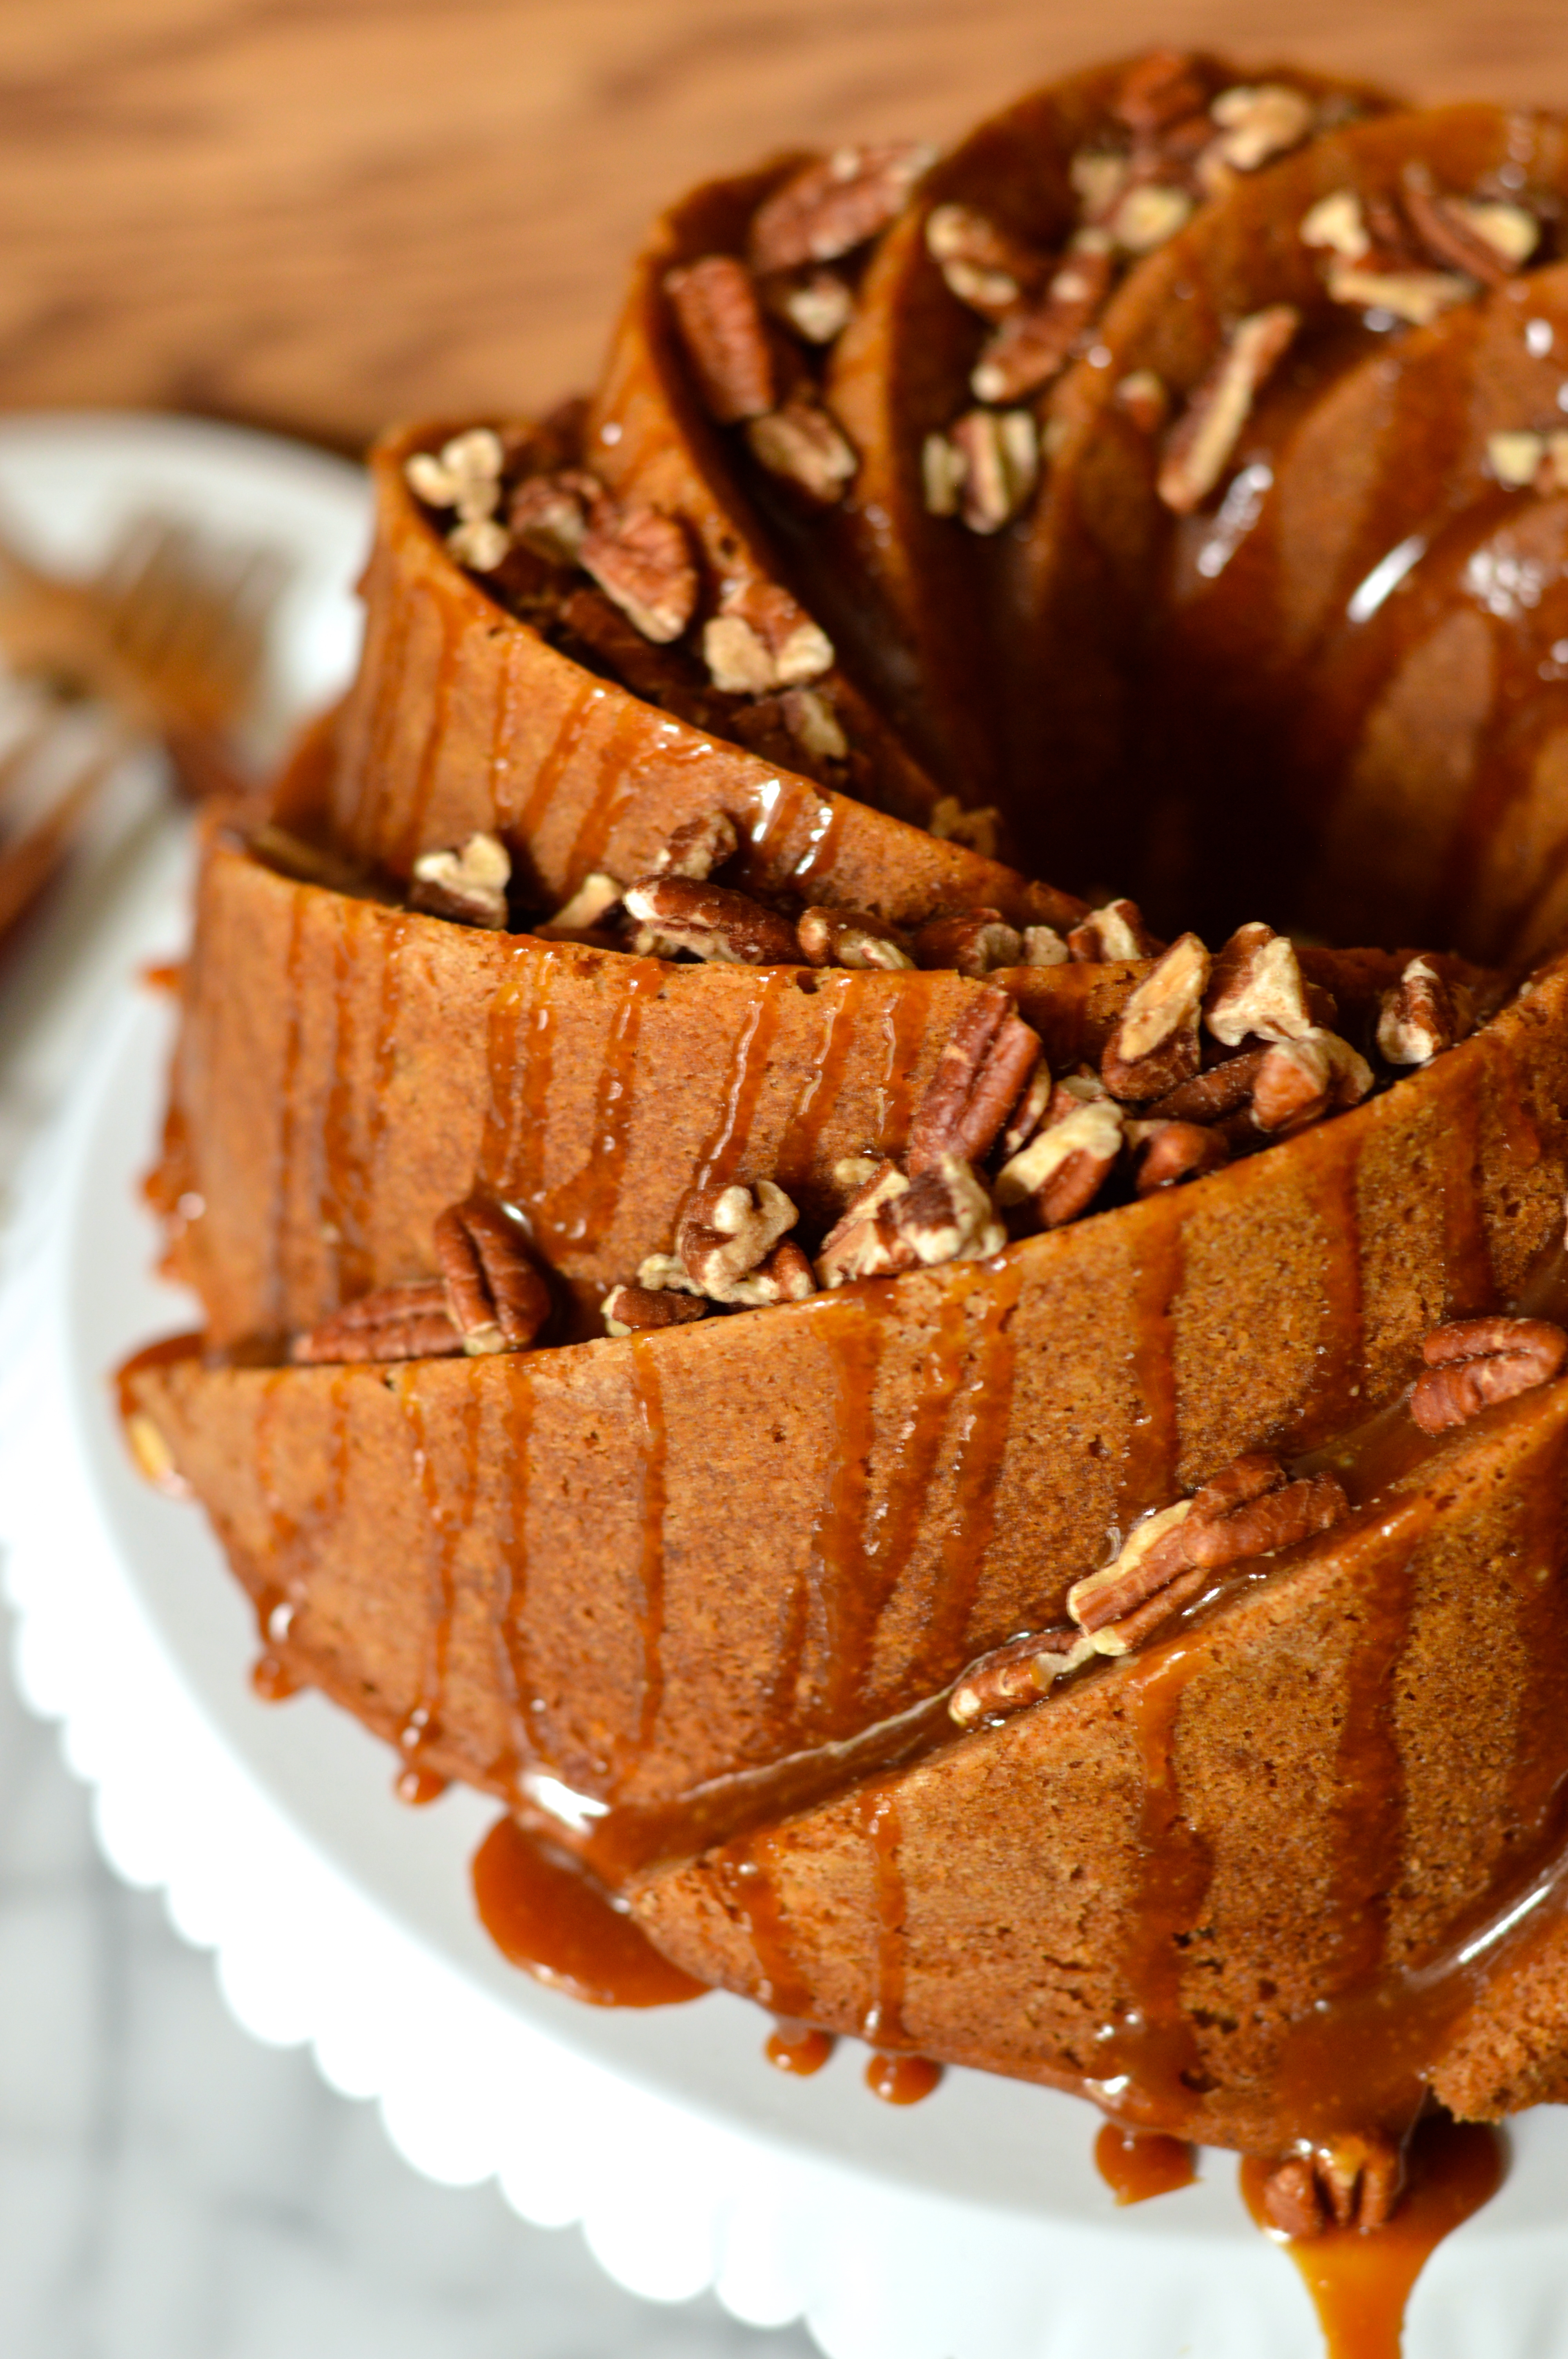 Apple Bundt Cake With Caramel Drizzle